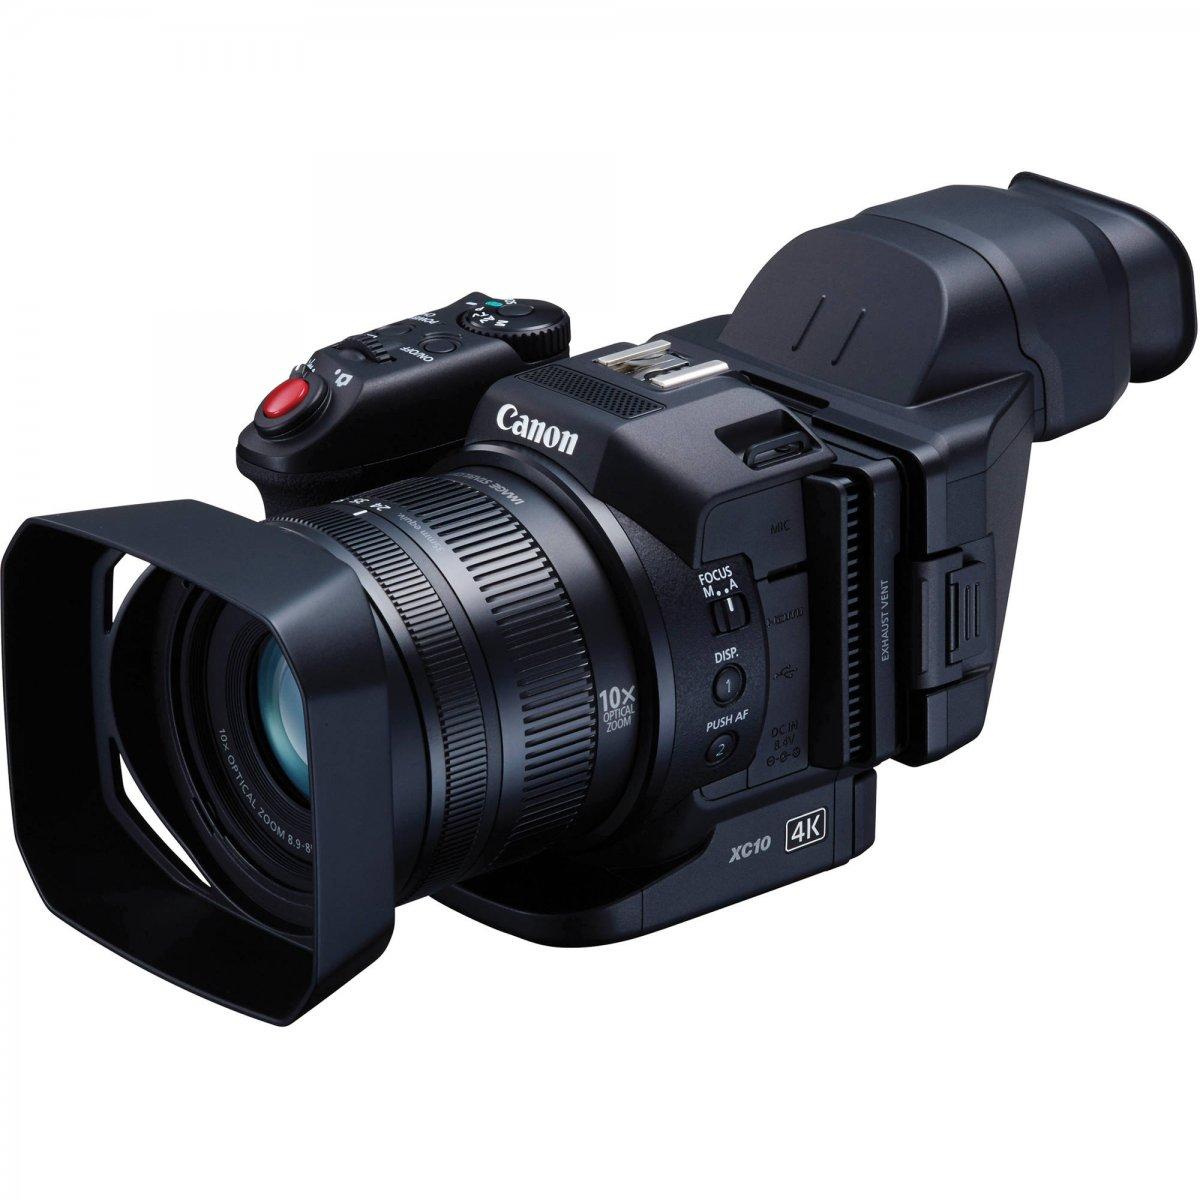 Canon XC10 Kit Cartão CFast 64GB